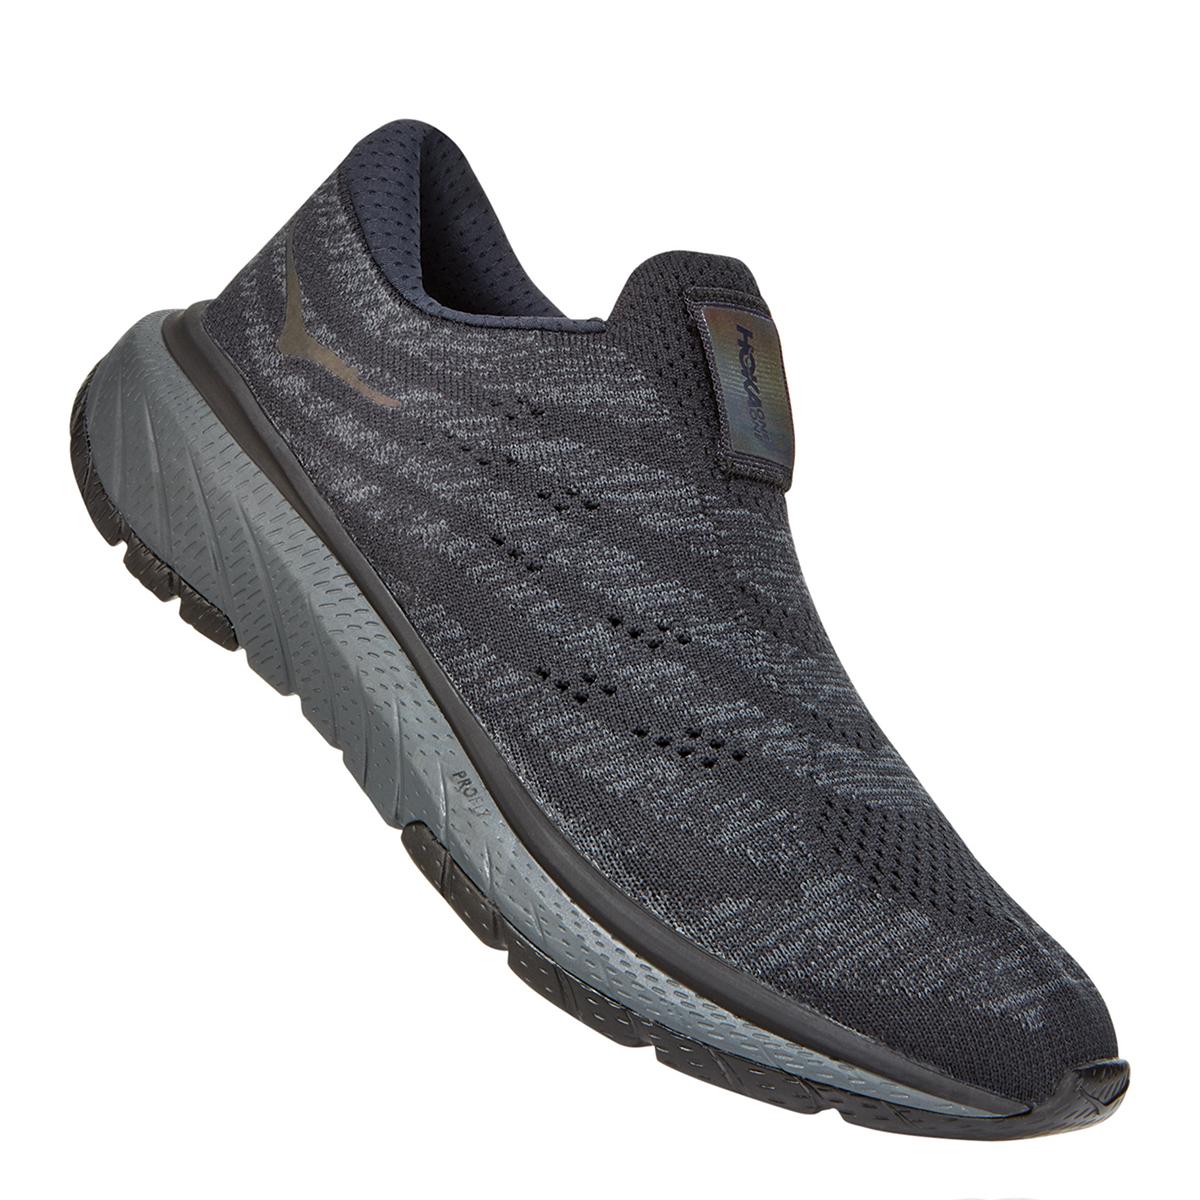 Women's Hoka One One Cavu 3 Slip Running Shoe - Color: Black/Dark Shadow - Size: 5 - Width: Regular, Black/Dark Shadow, large, image 5